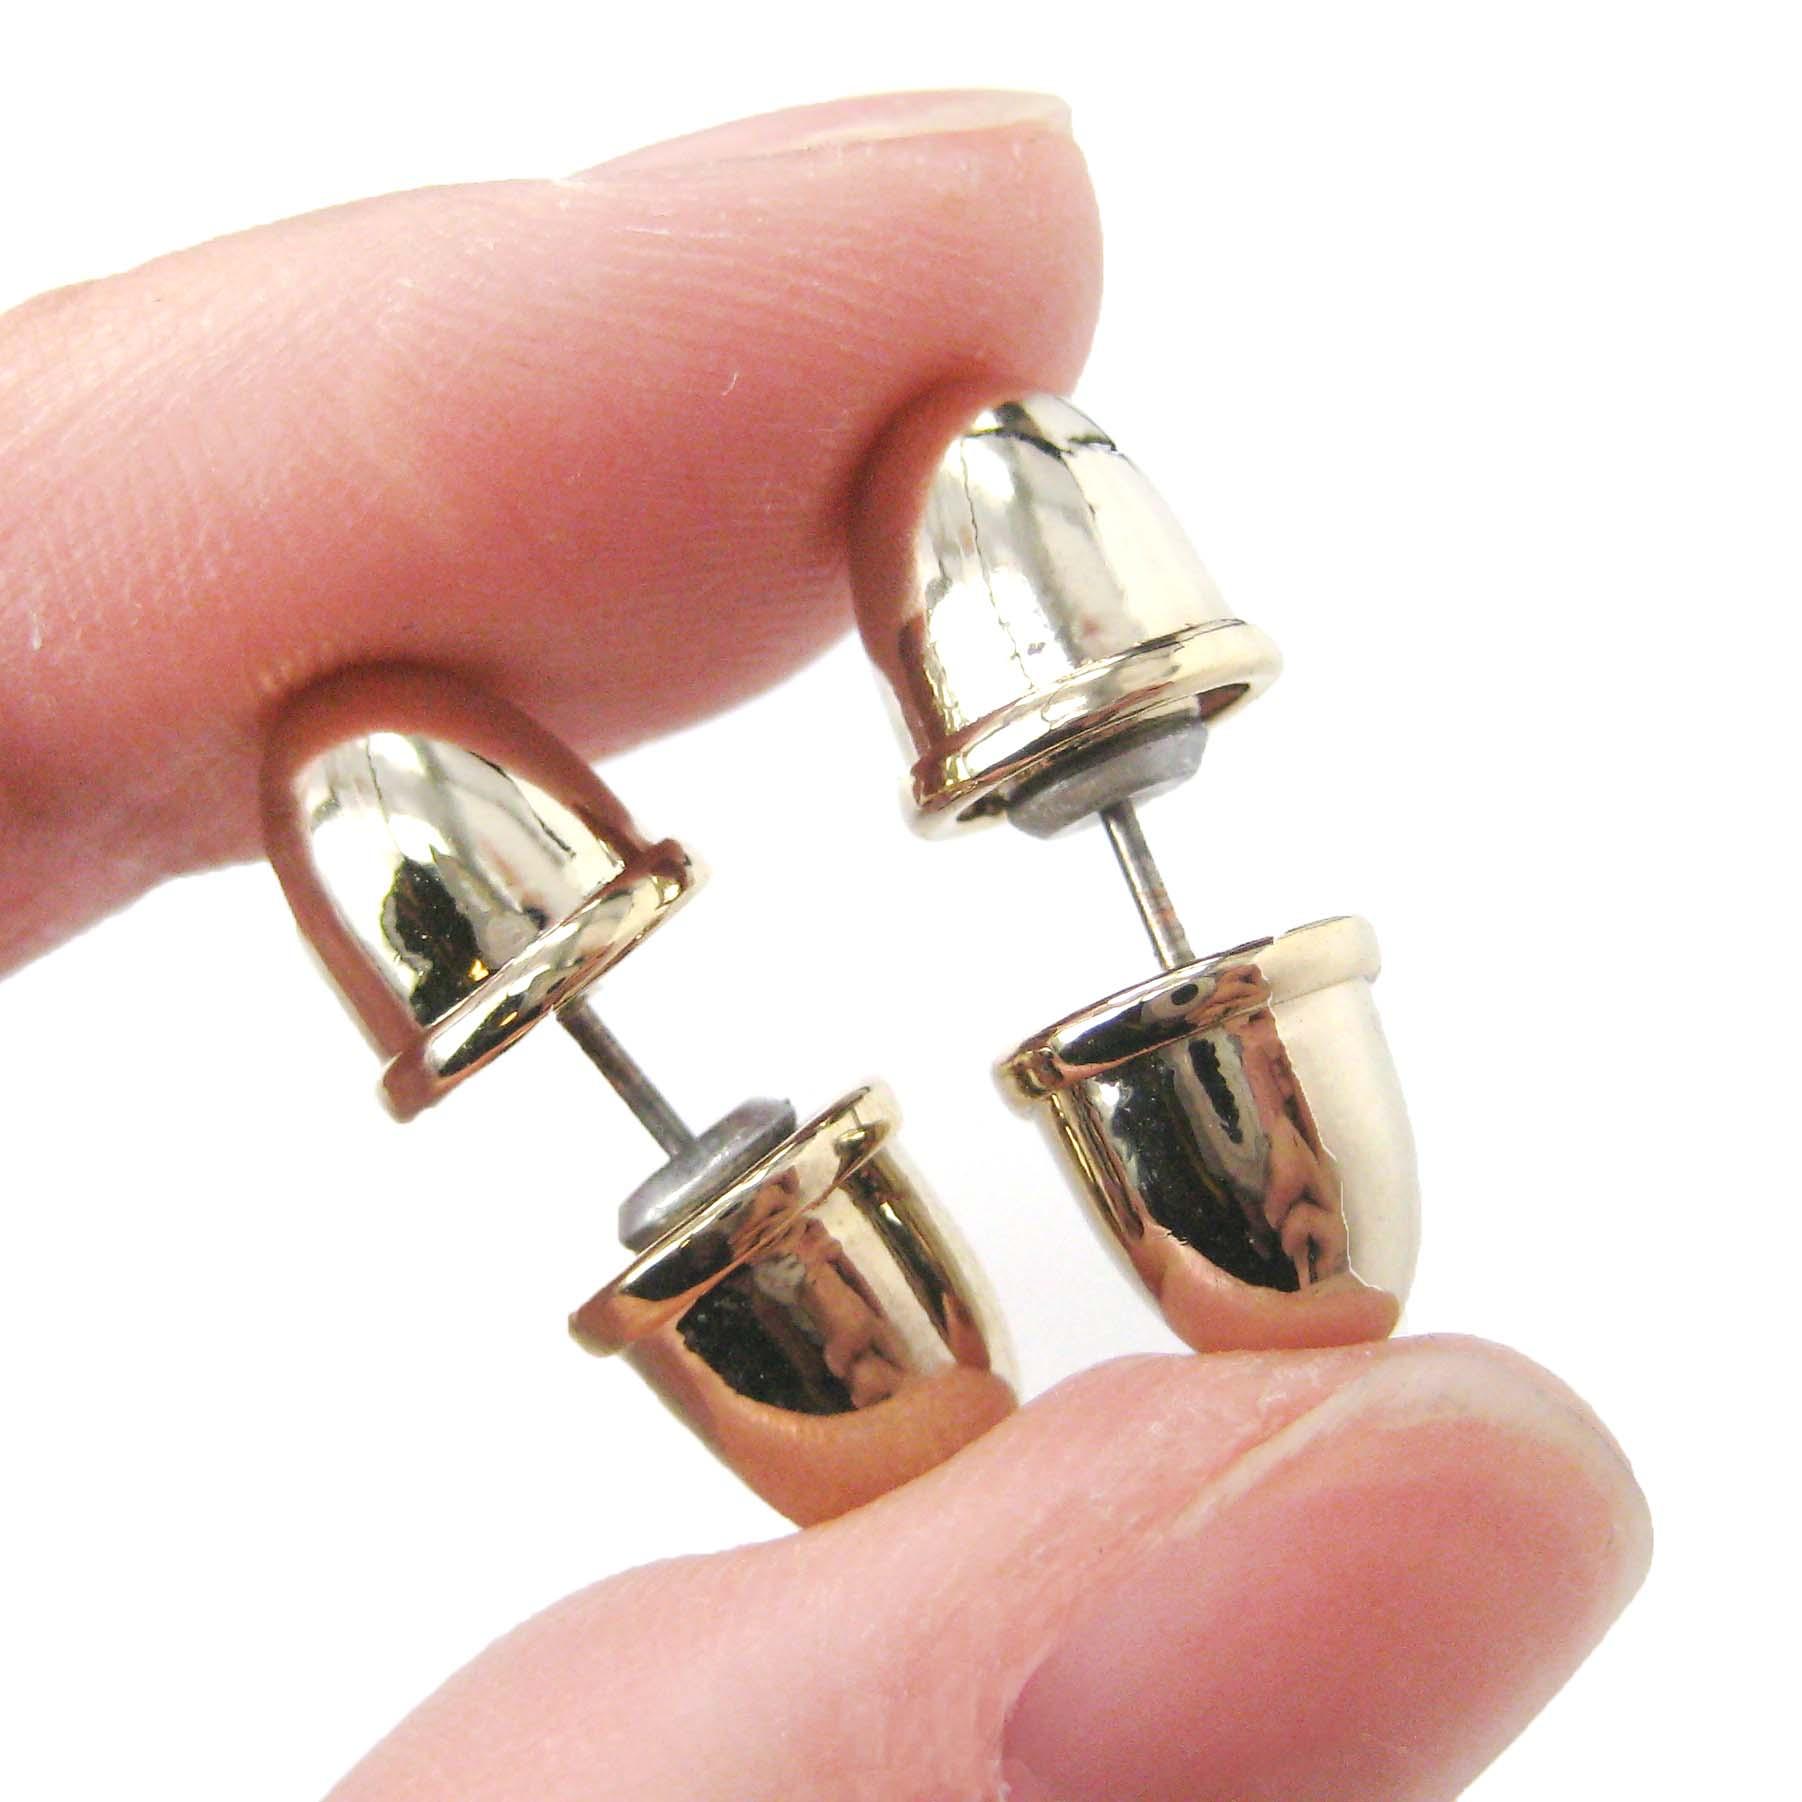 Bullet Shaped Faux Plug Fake Gauge Stud Earrings in Shiny